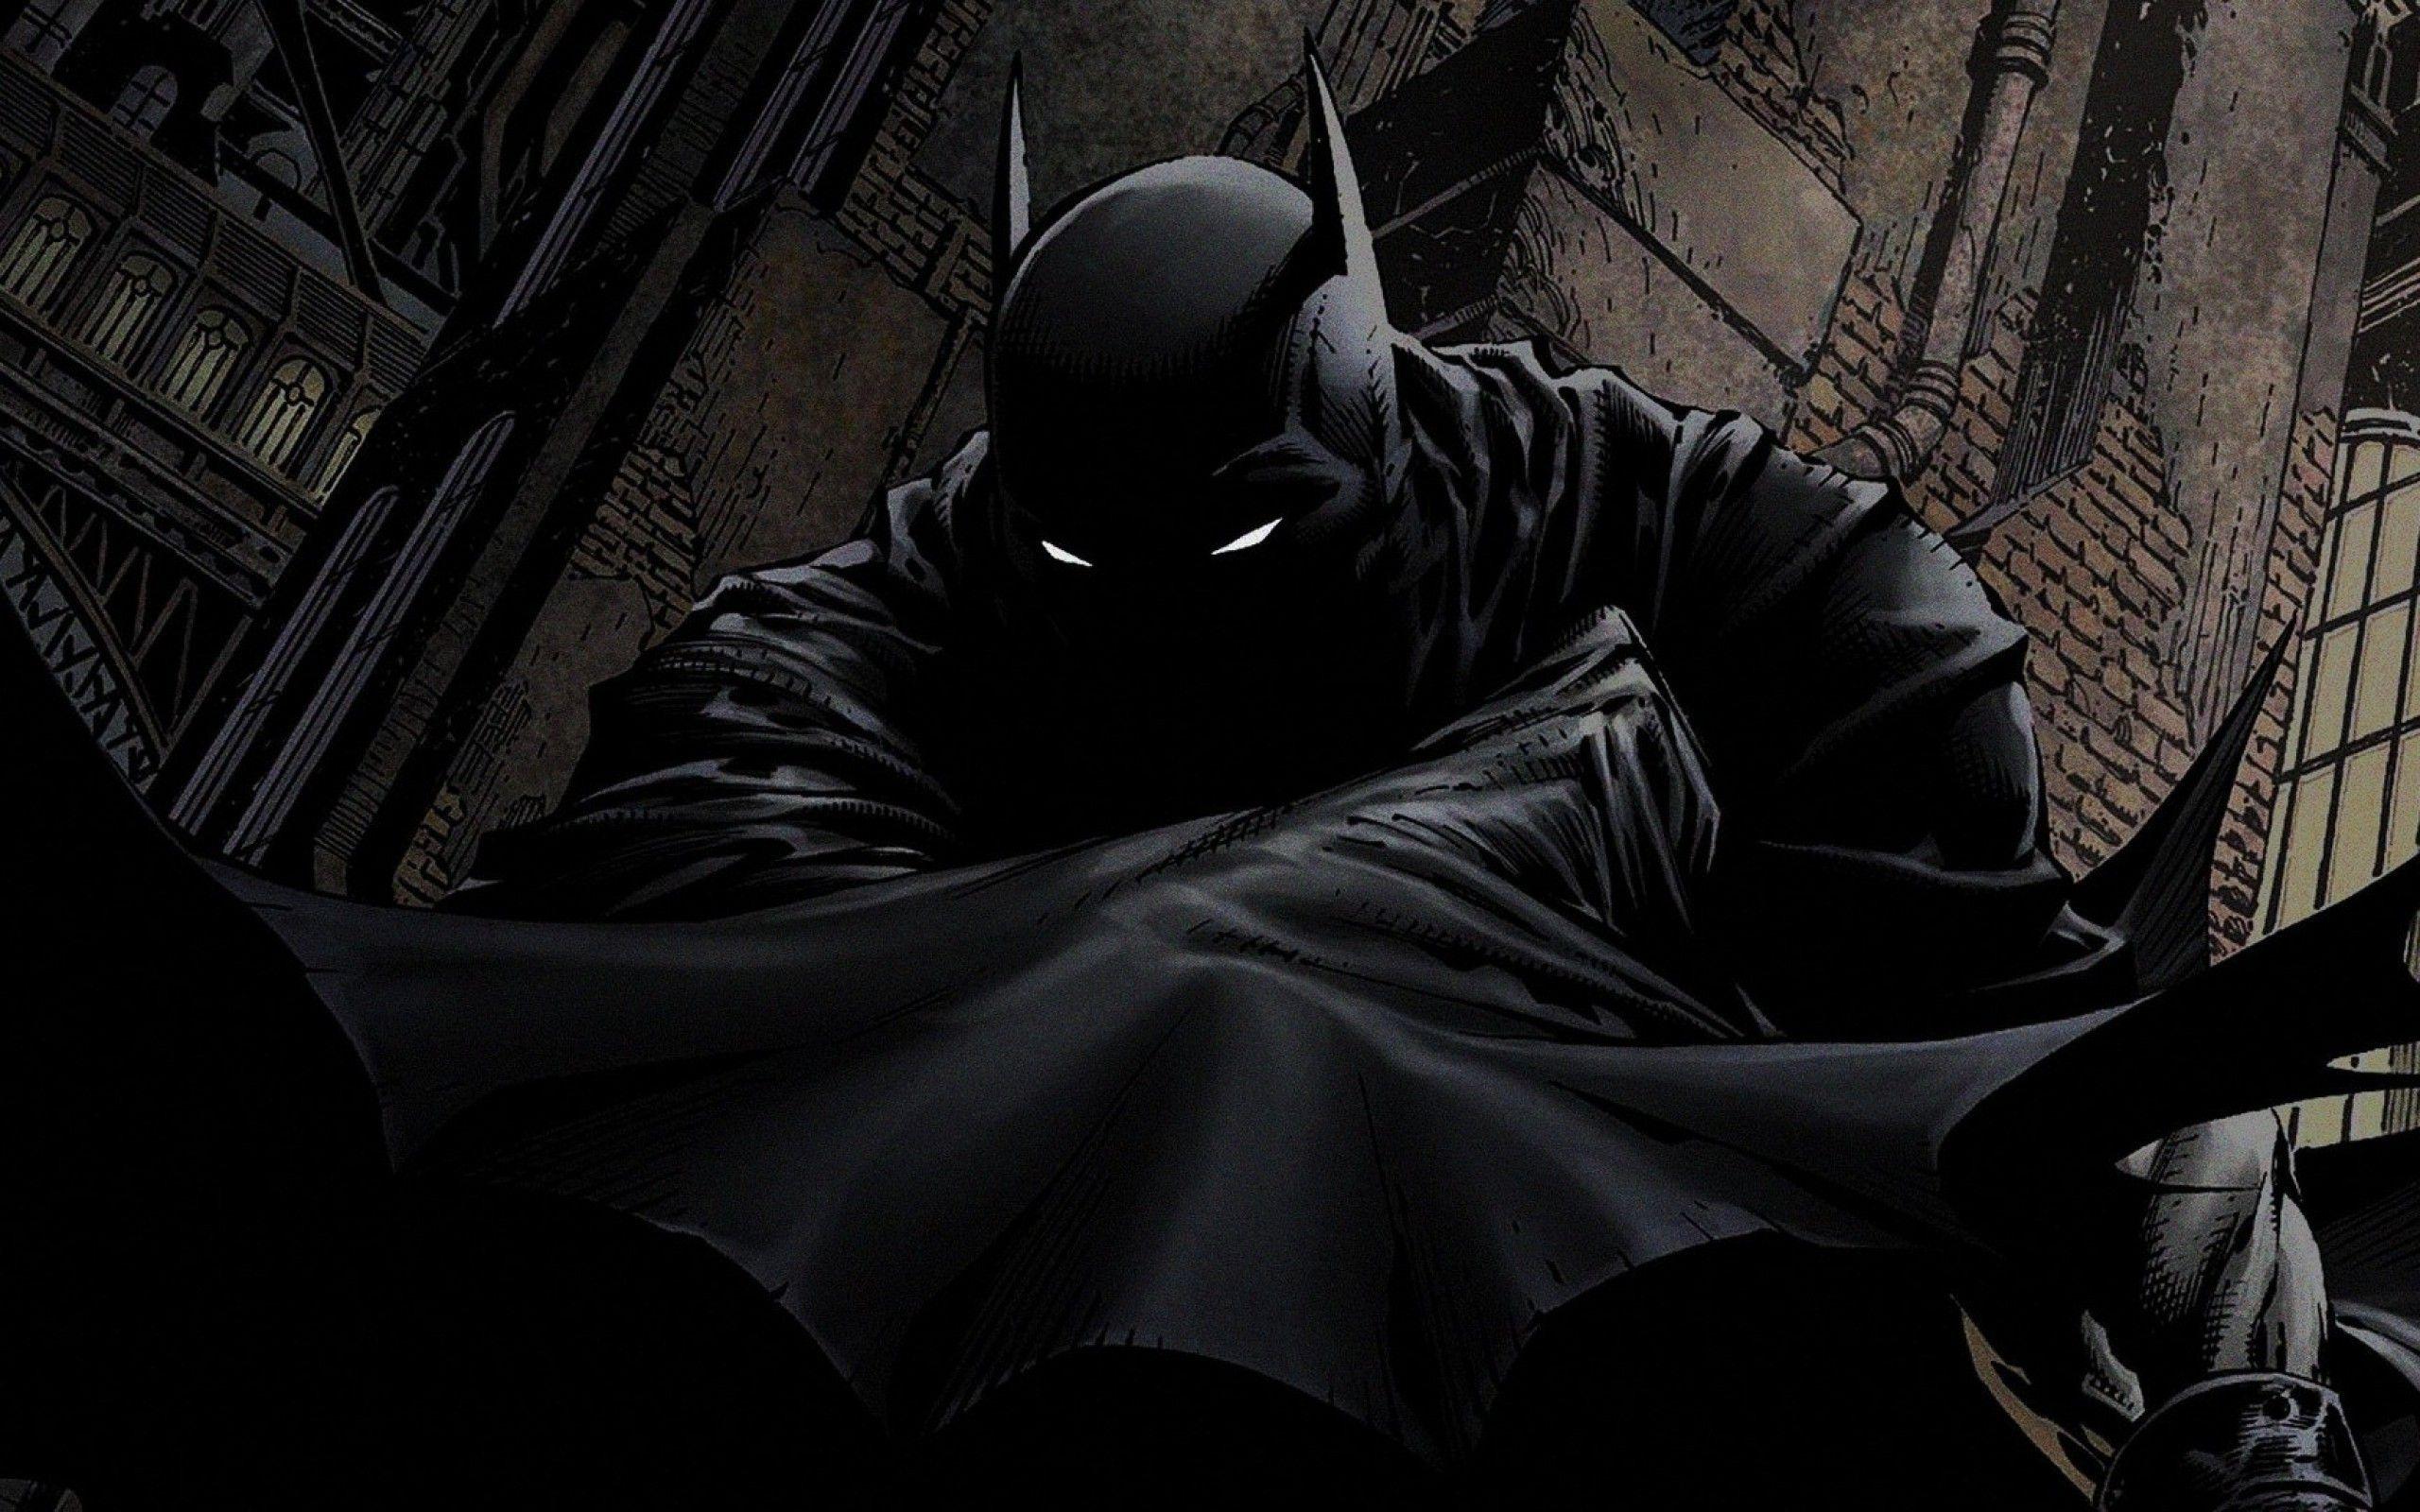 Download Hd Wallpapers Of 140091 Batman Dc Comics Free Download